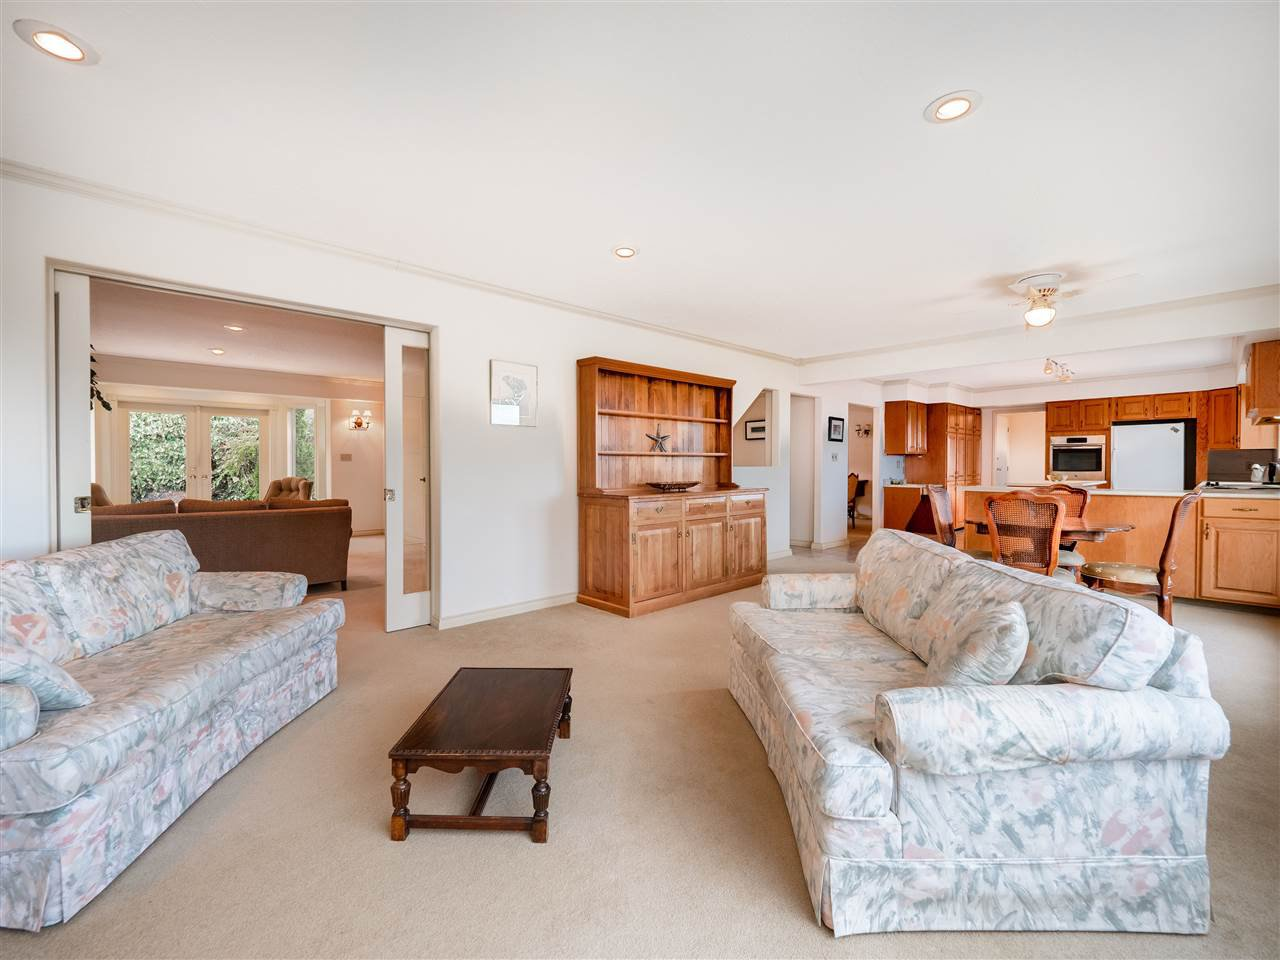 Photo 9: Photos: 5107 RADCLIFFE Road in Sechelt: Sechelt District House for sale (Sunshine Coast)  : MLS®# R2425277